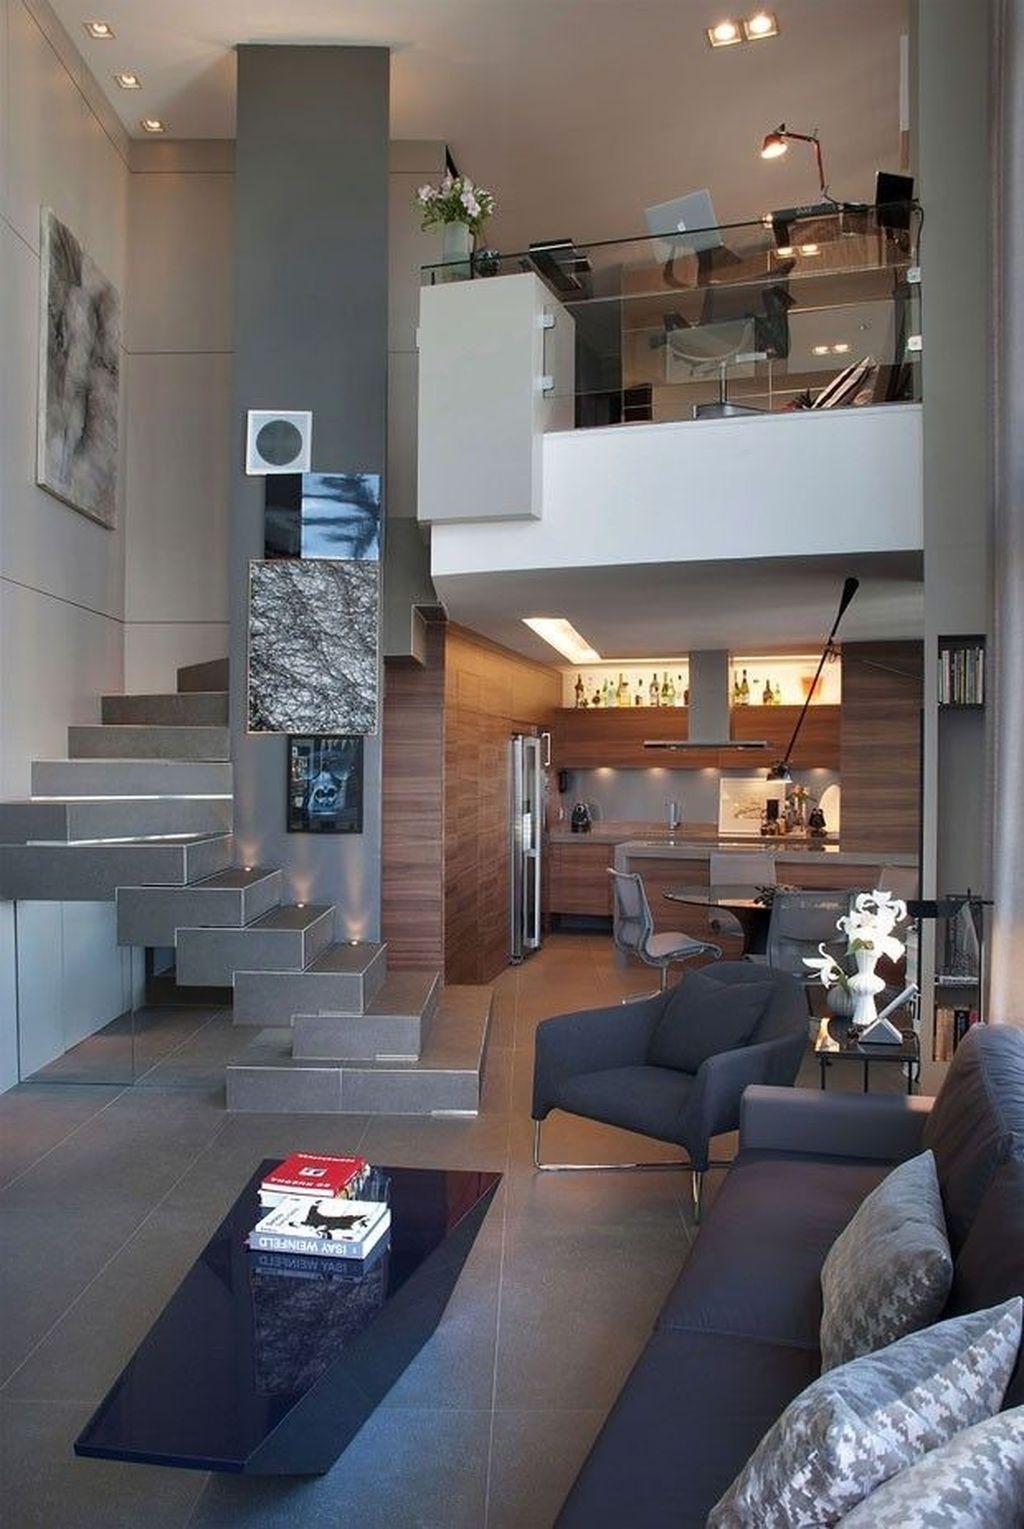 brilliant loft bedroom decor ideas and designs home interior design also rh pinterest